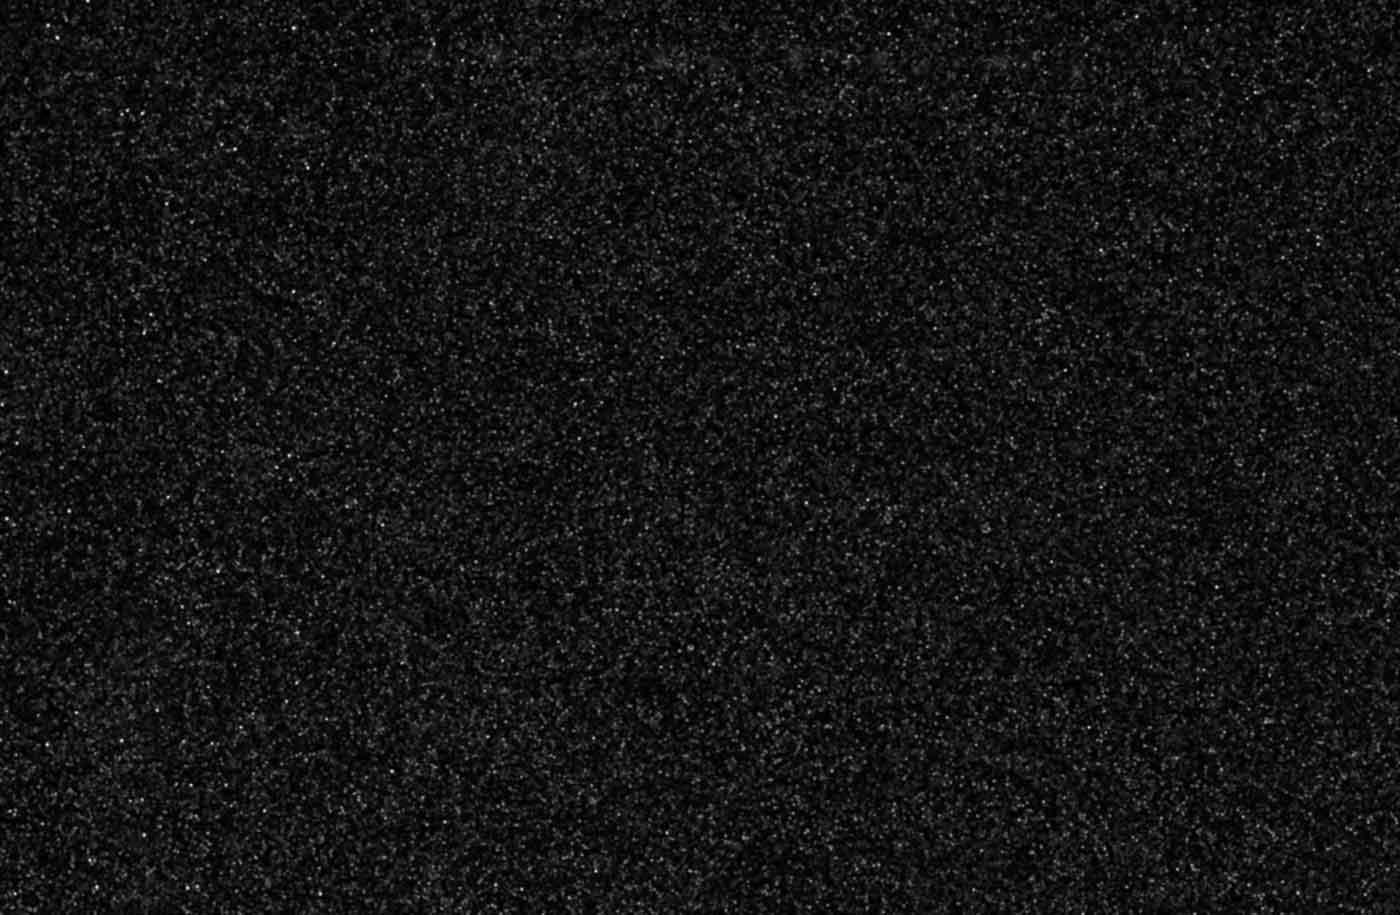 Black-Friday-banner-background